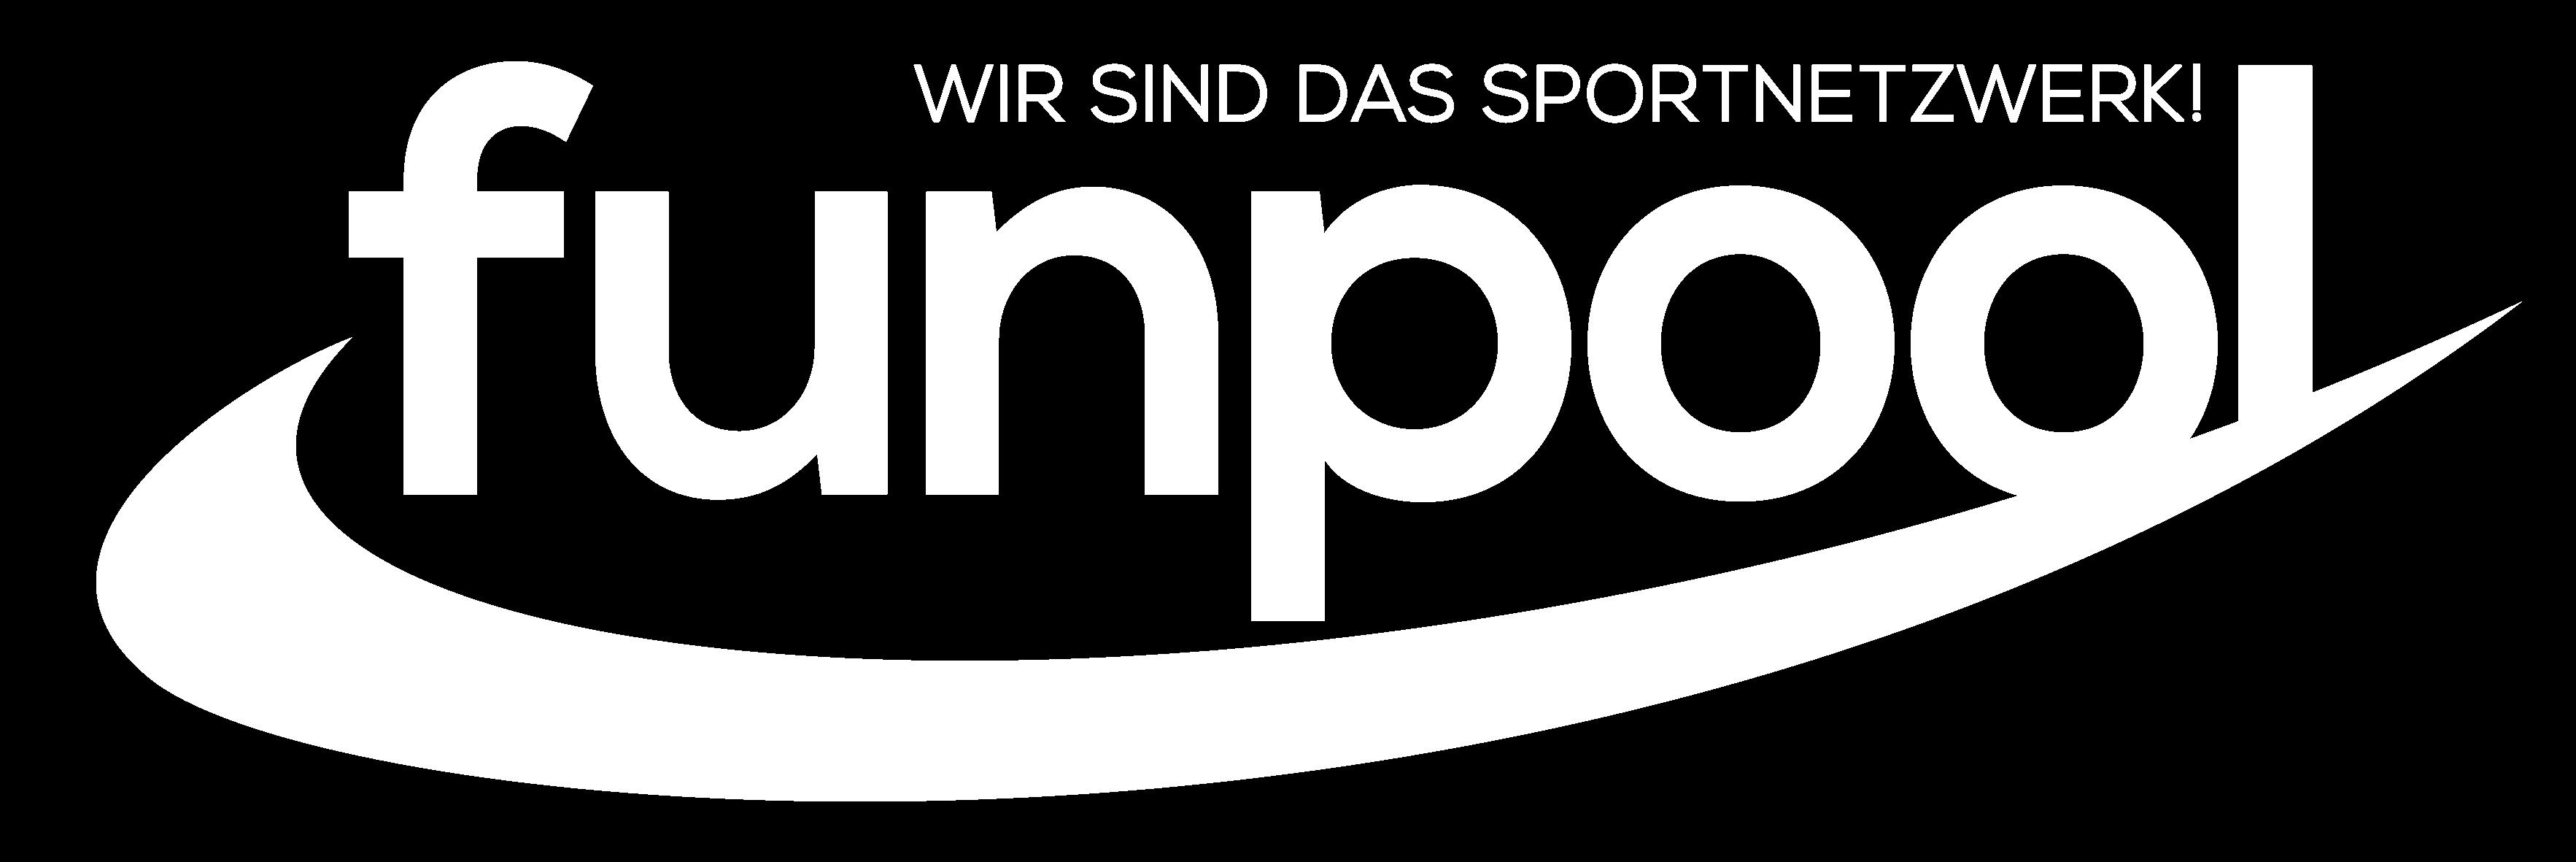 funpool – Das Sportnetzwerk